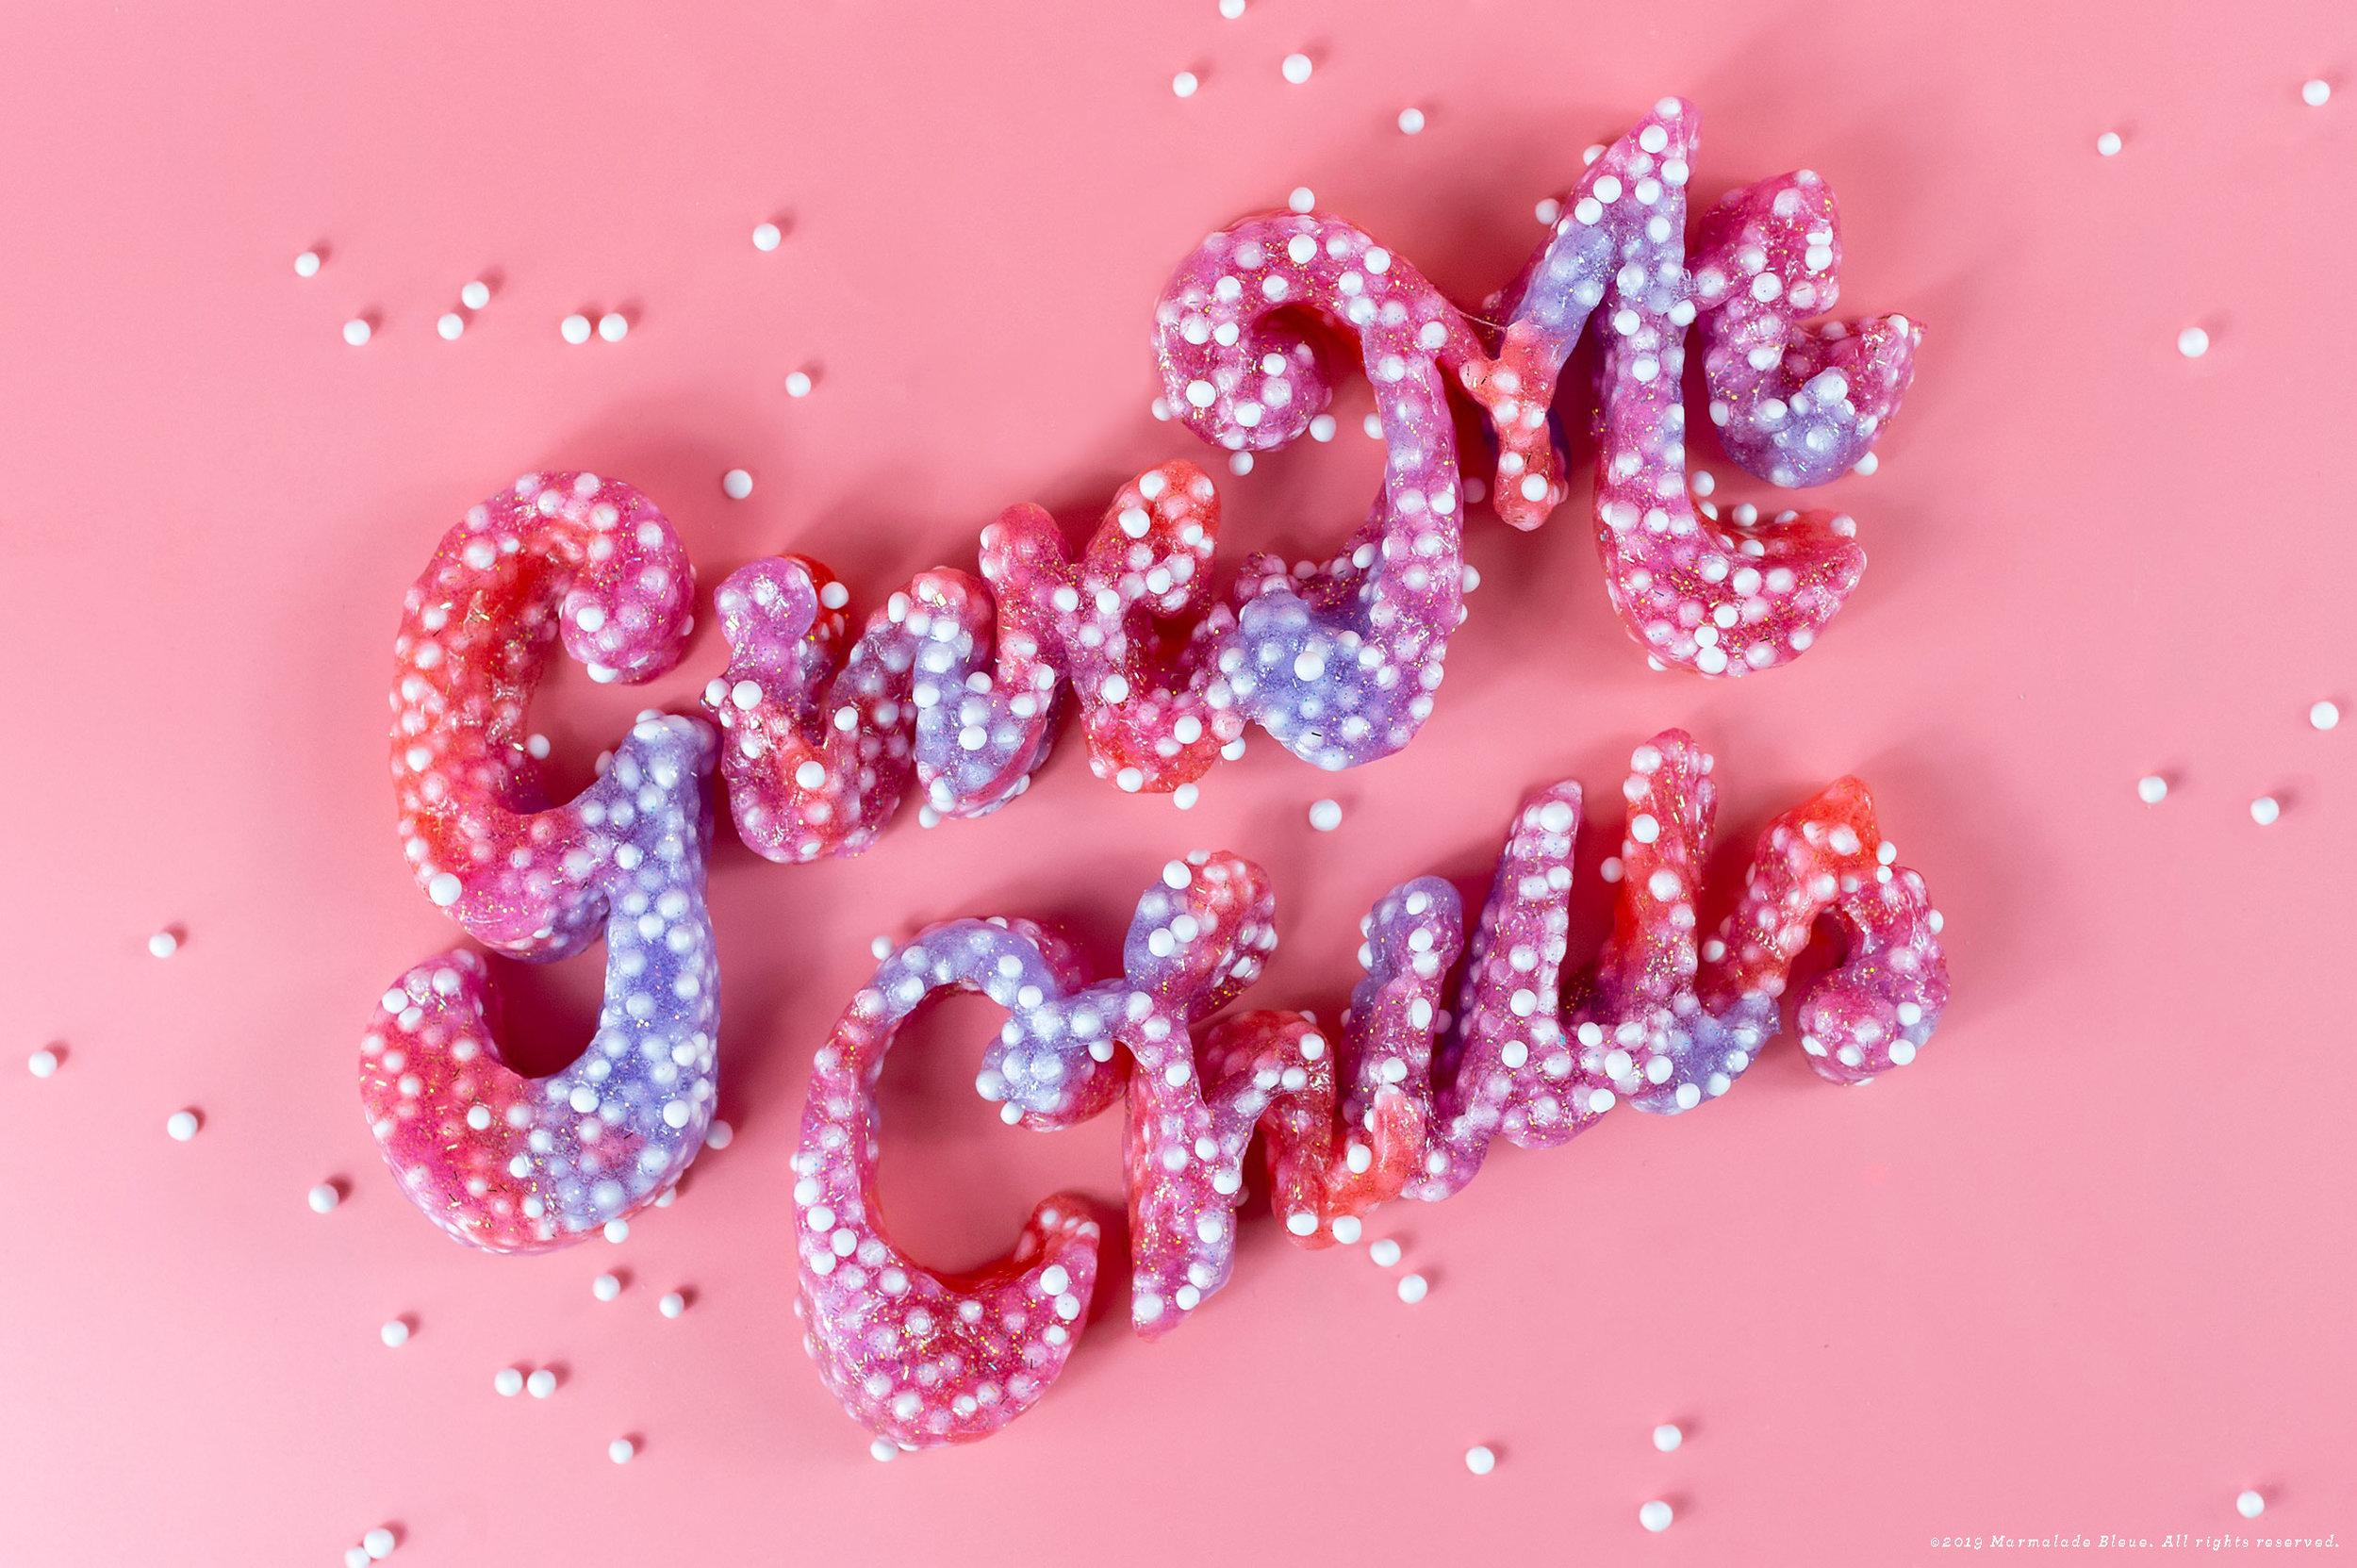 ASMR Dimensional Slime Lettering